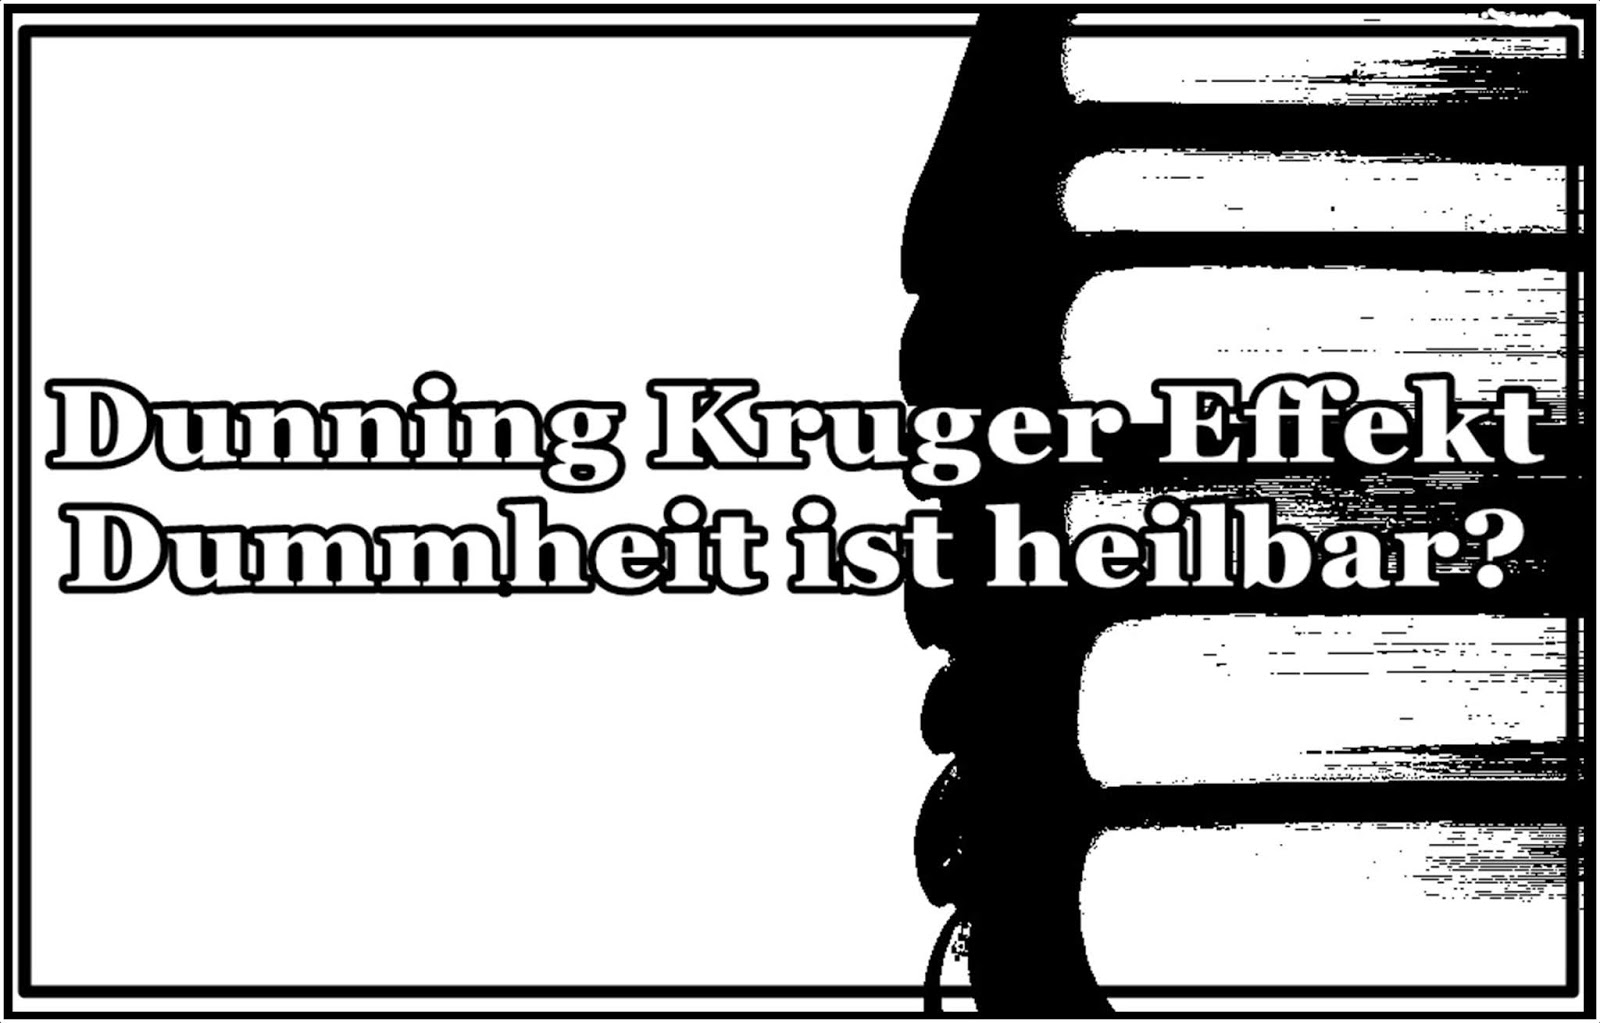 PANOPTIKUS BLOG: Dunning Kruger Effekt - Dummheit ist heilbar?